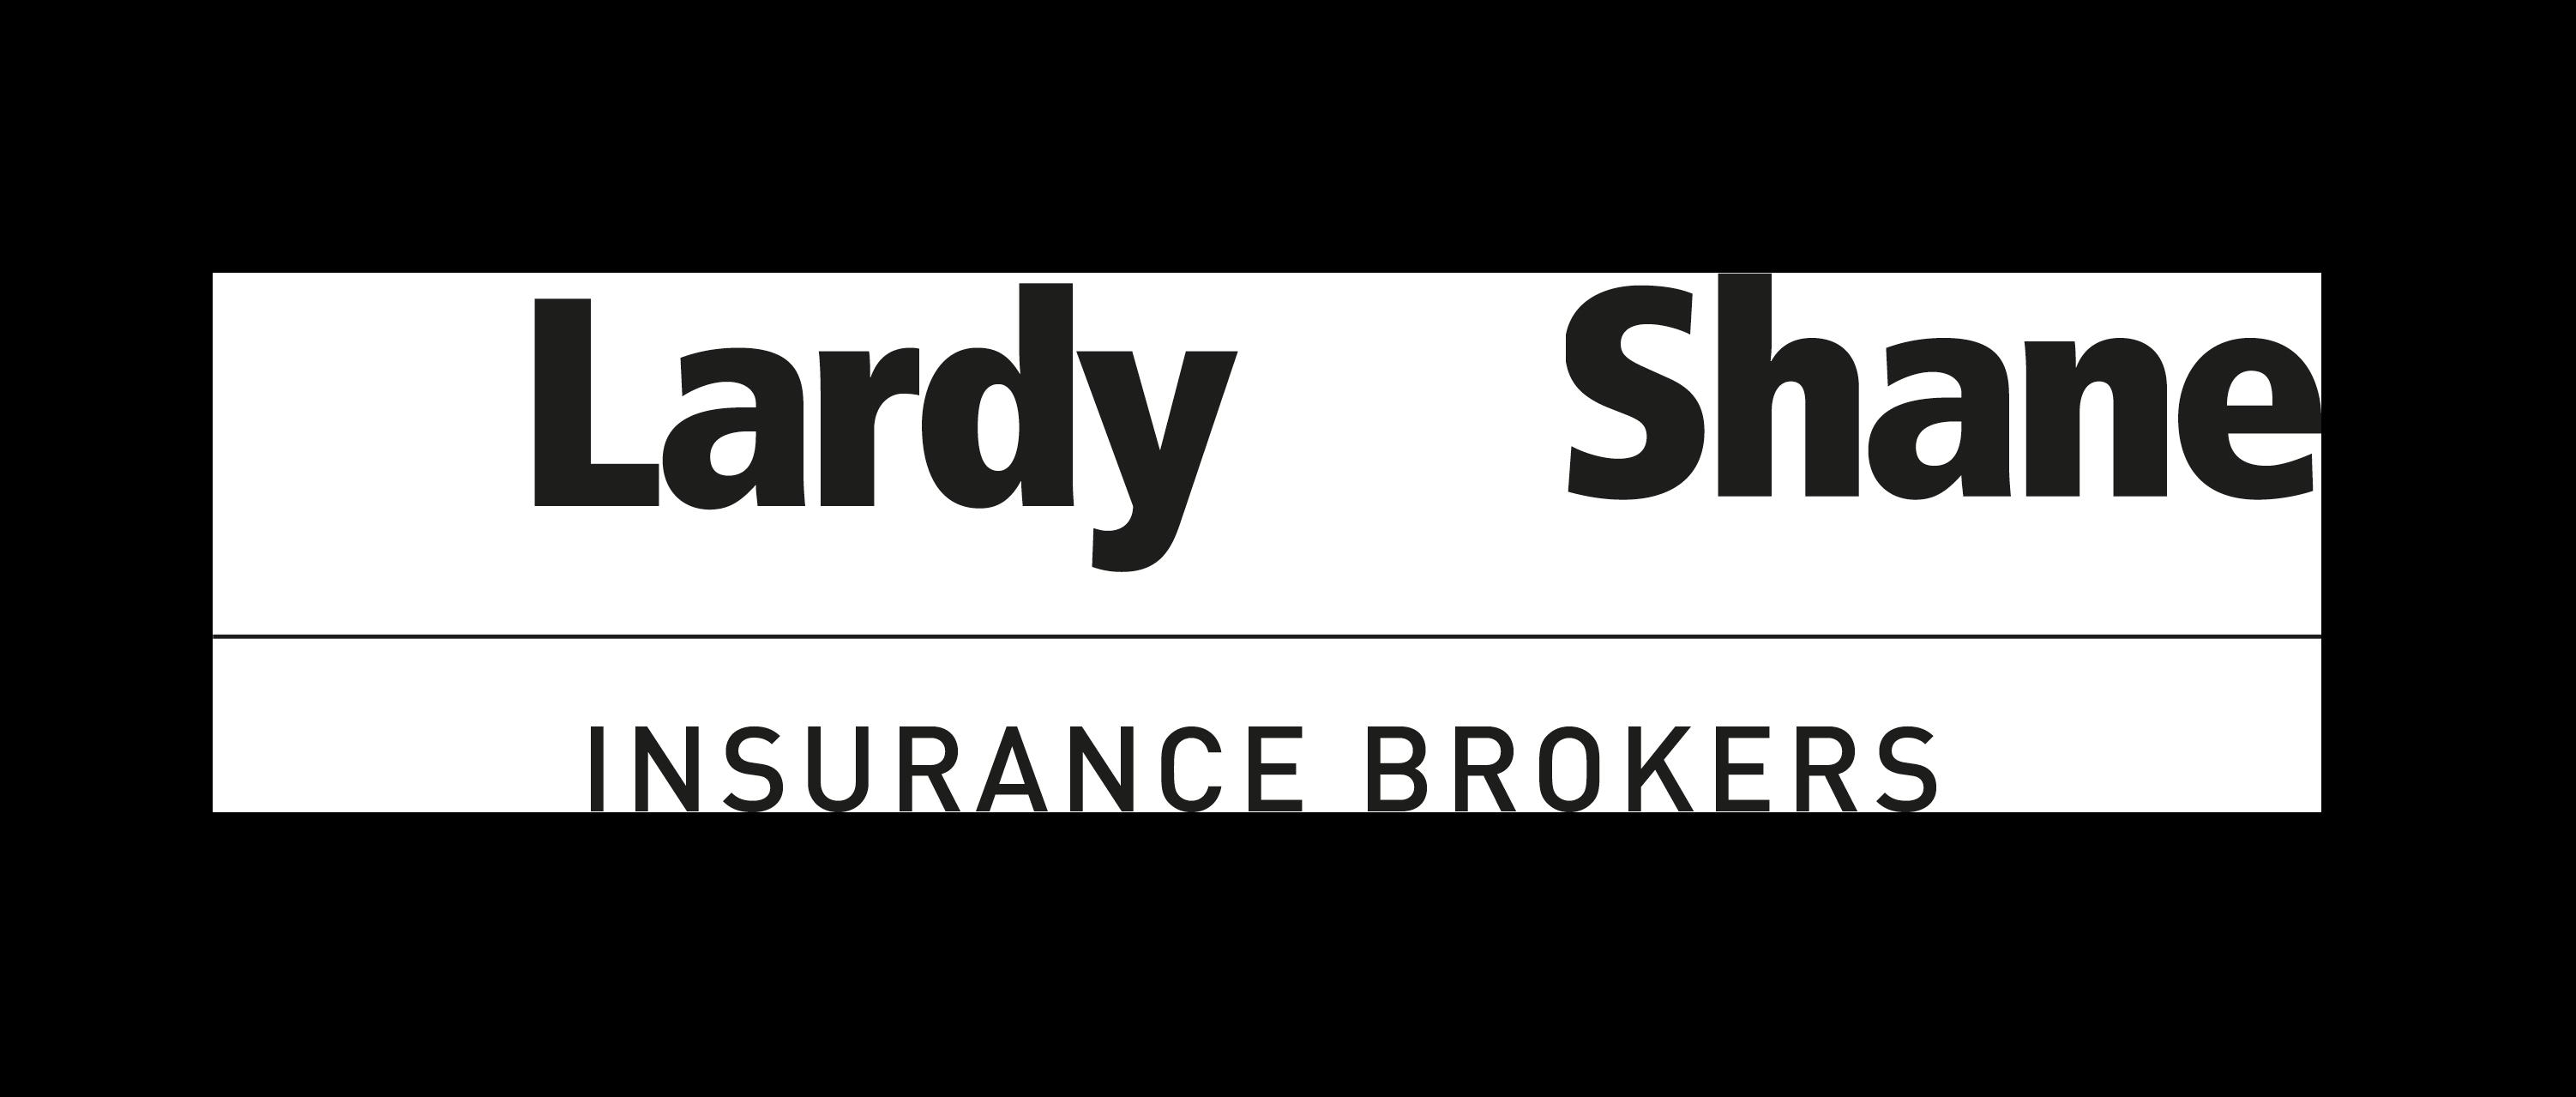 McLardy McShane Sydney